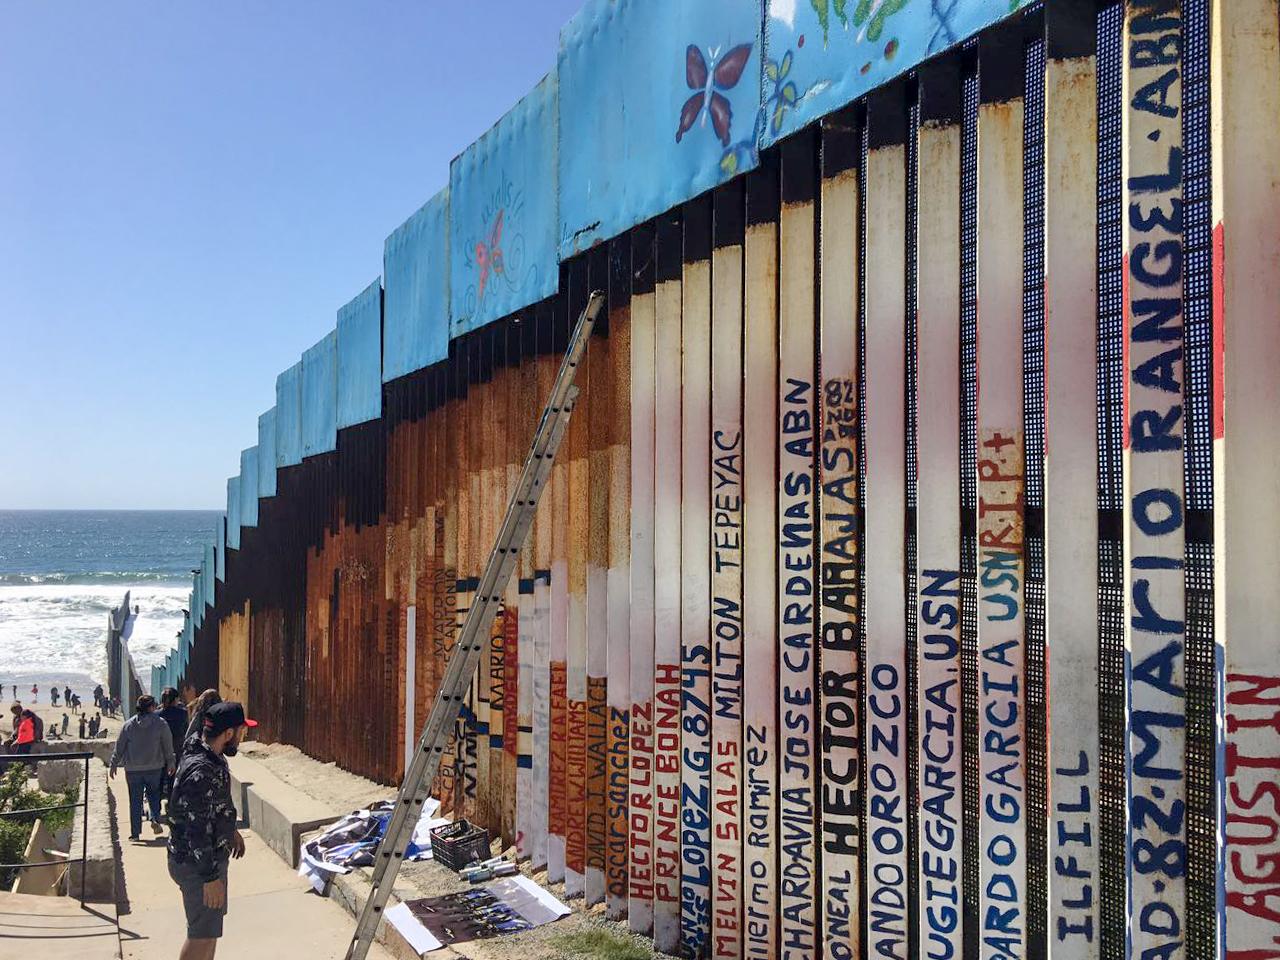 Mural near Playas de Tijuana